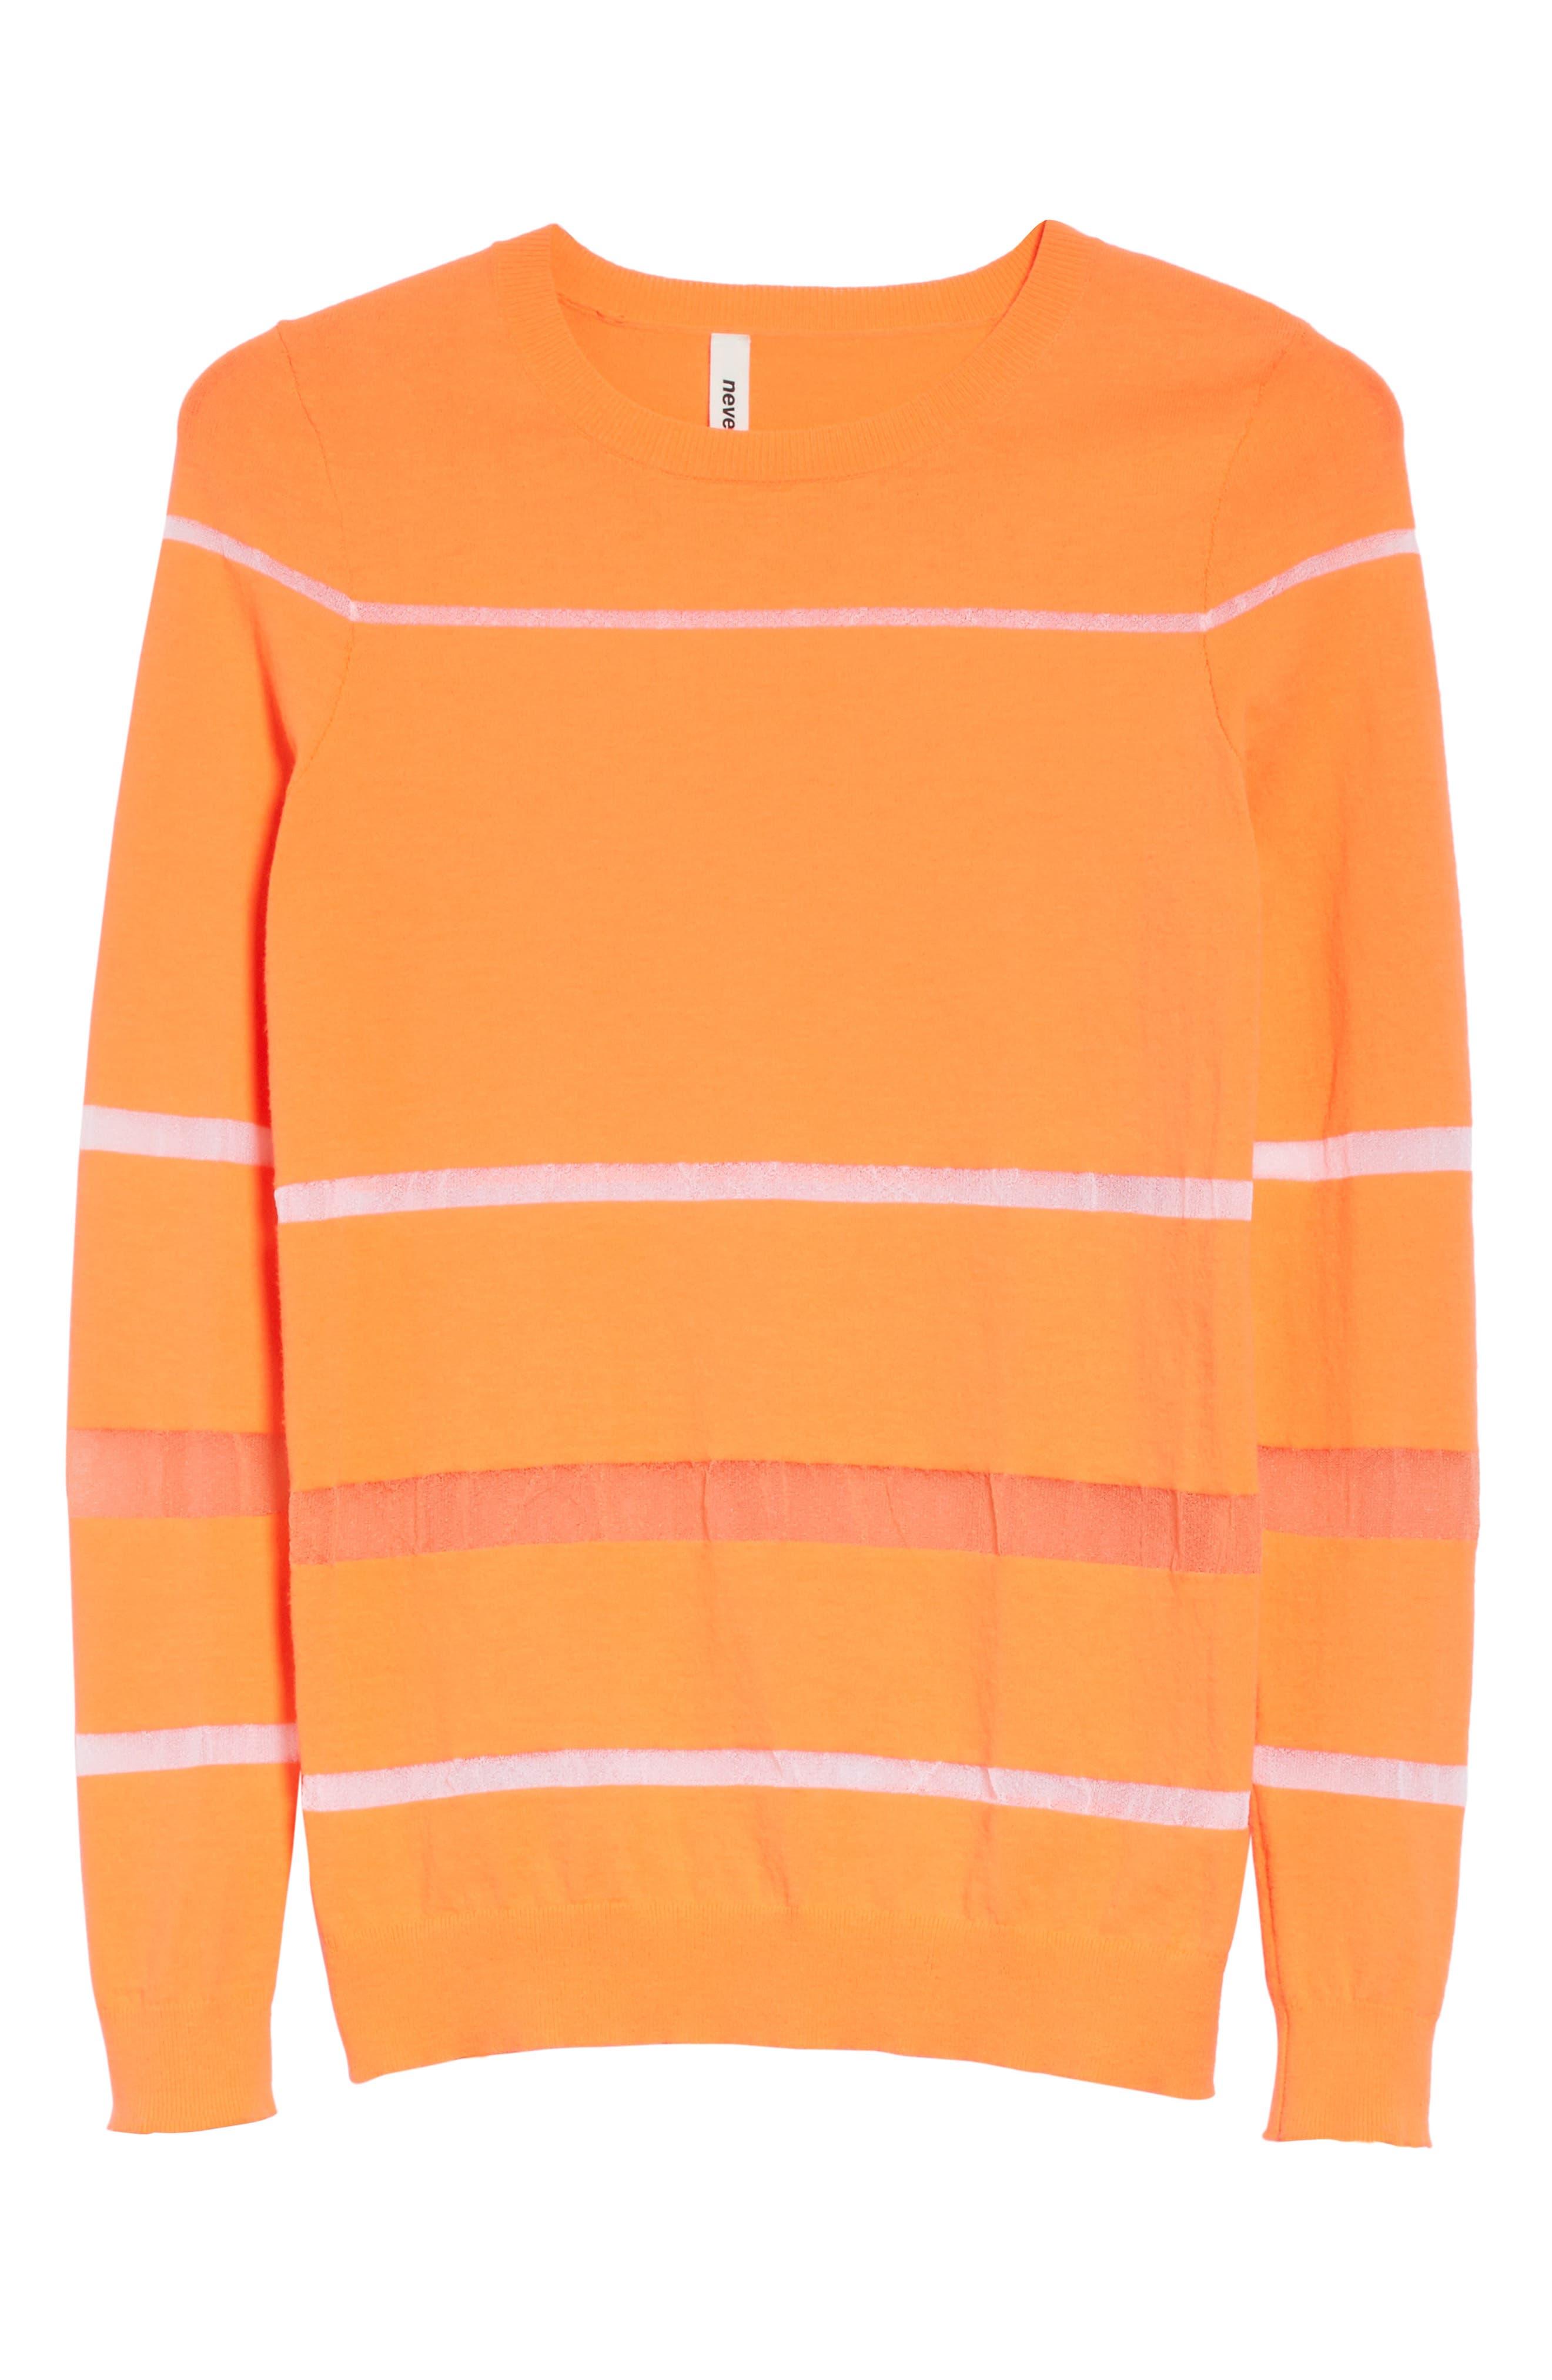 Illusion Stripe Crewneck Sweater,                             Alternate thumbnail 6, color,                             850